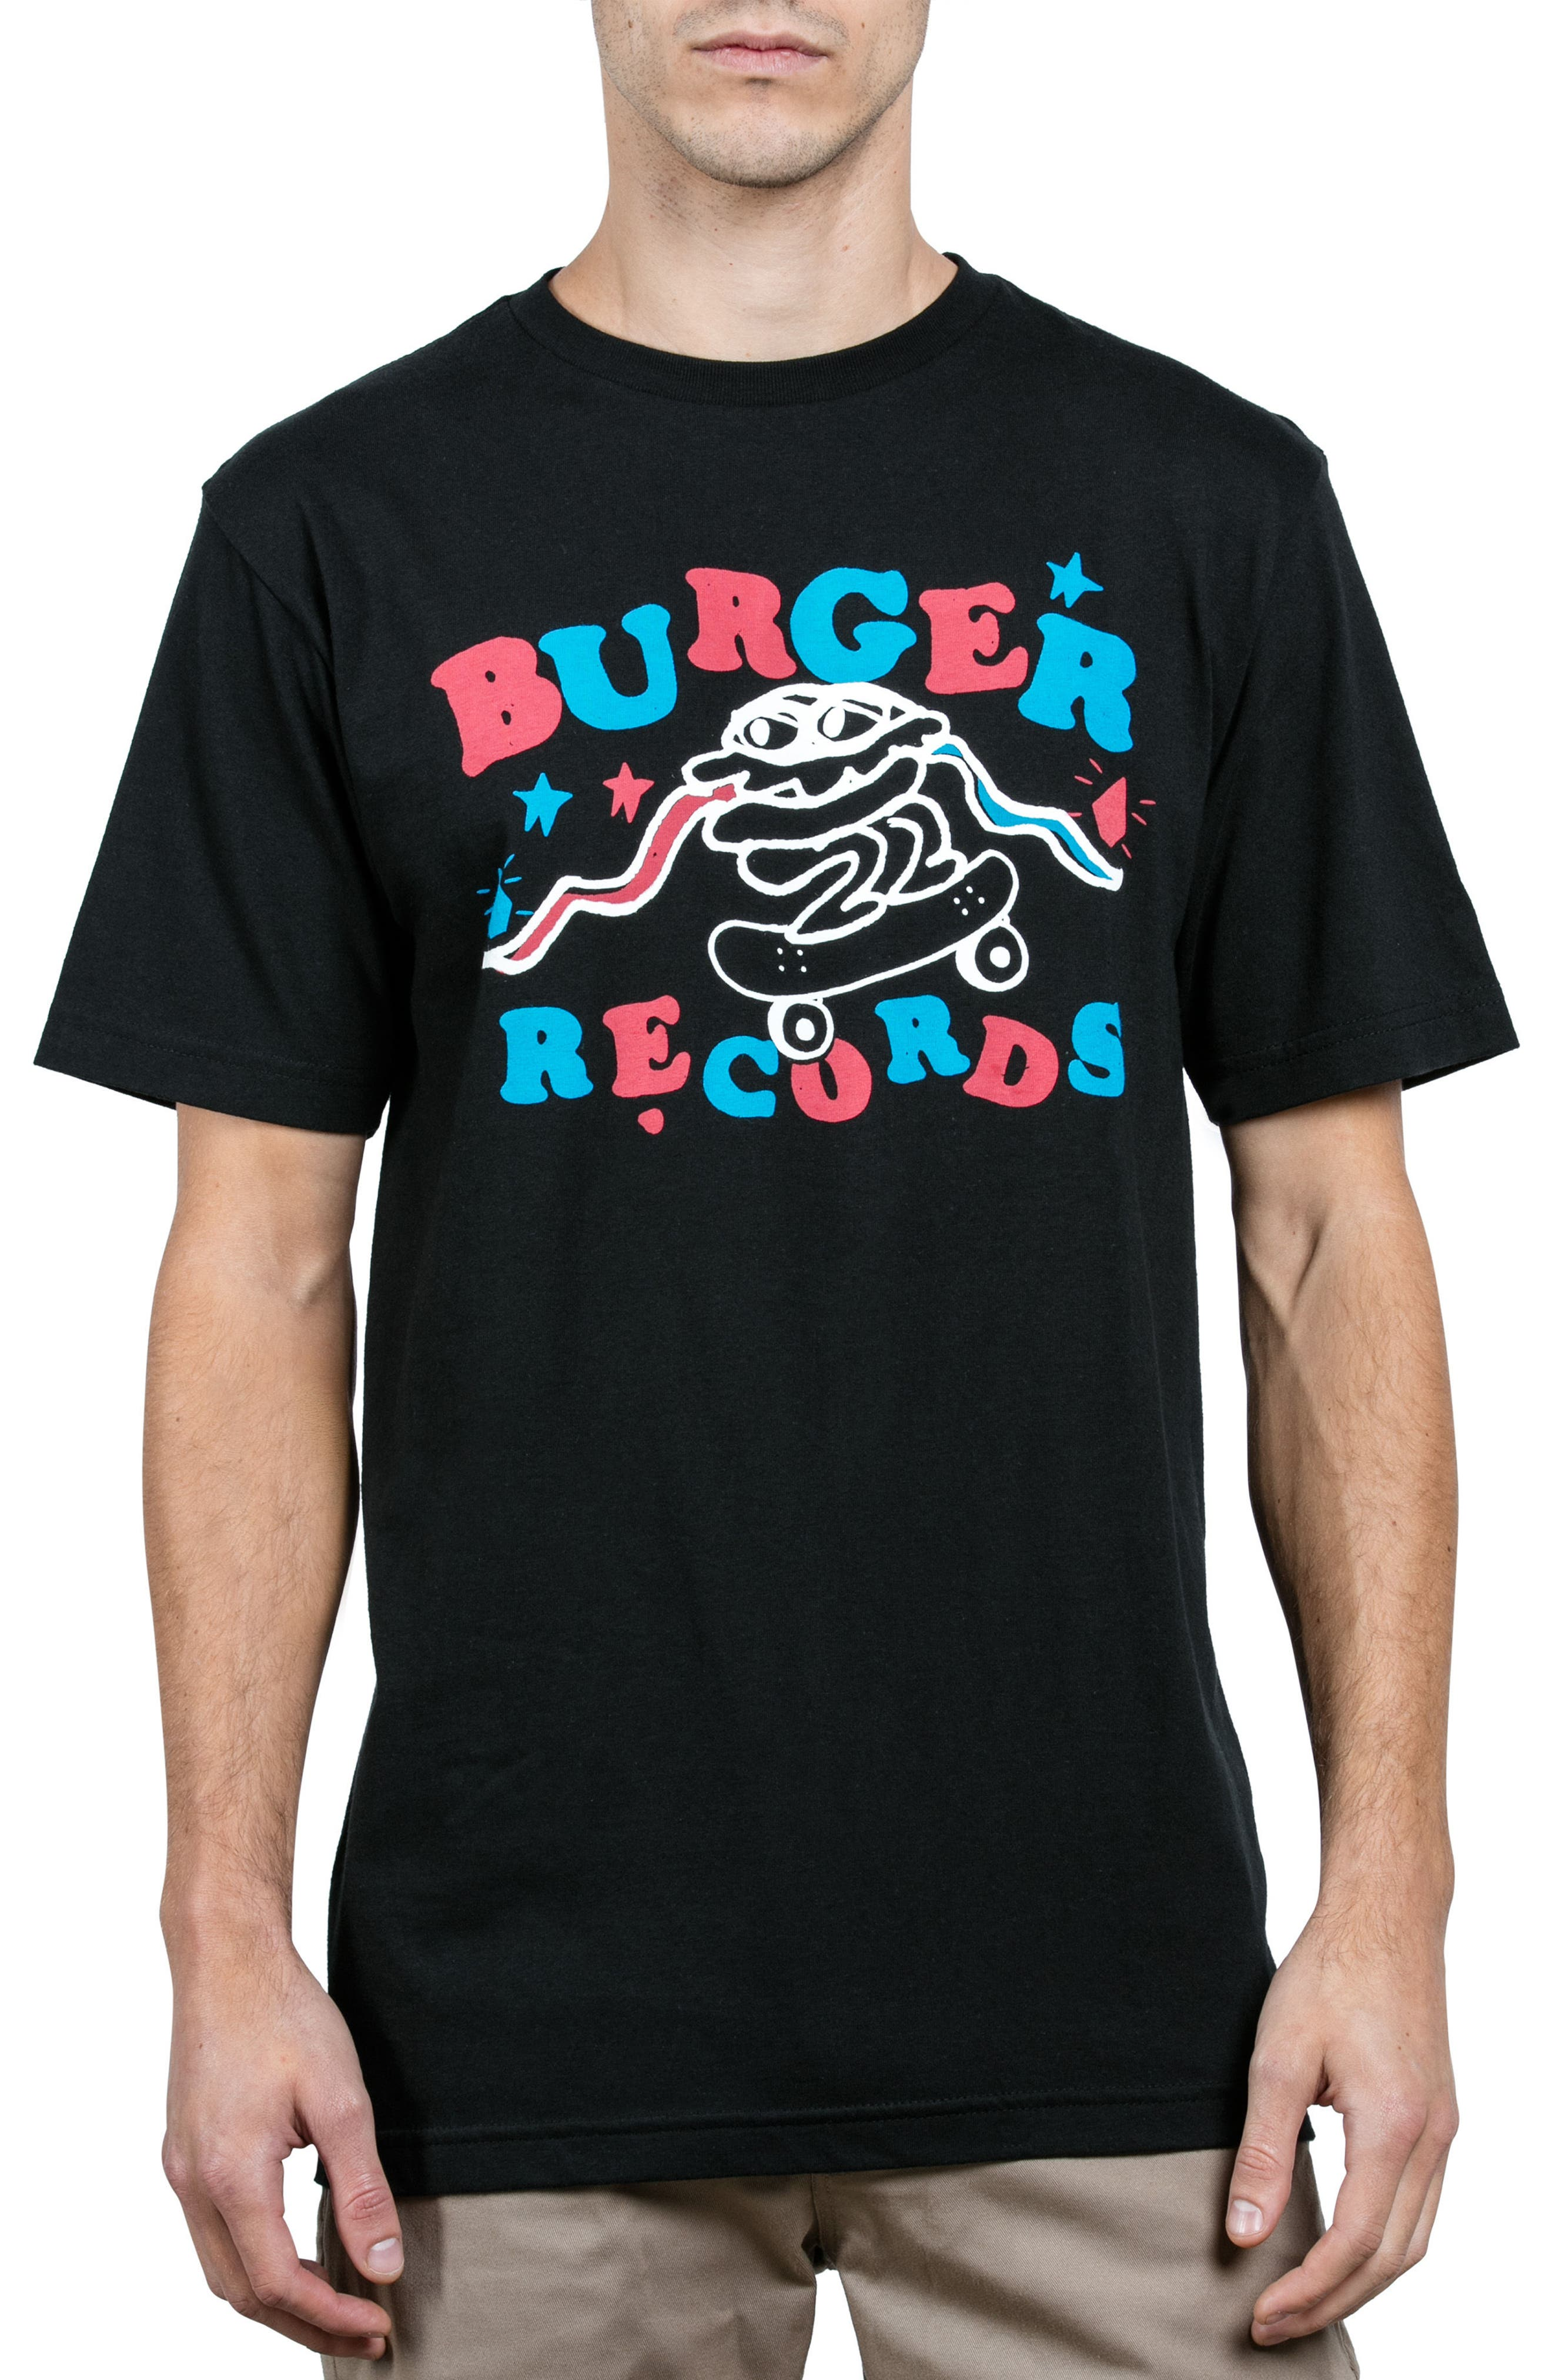 Volcom x Burger Records T-Shirt